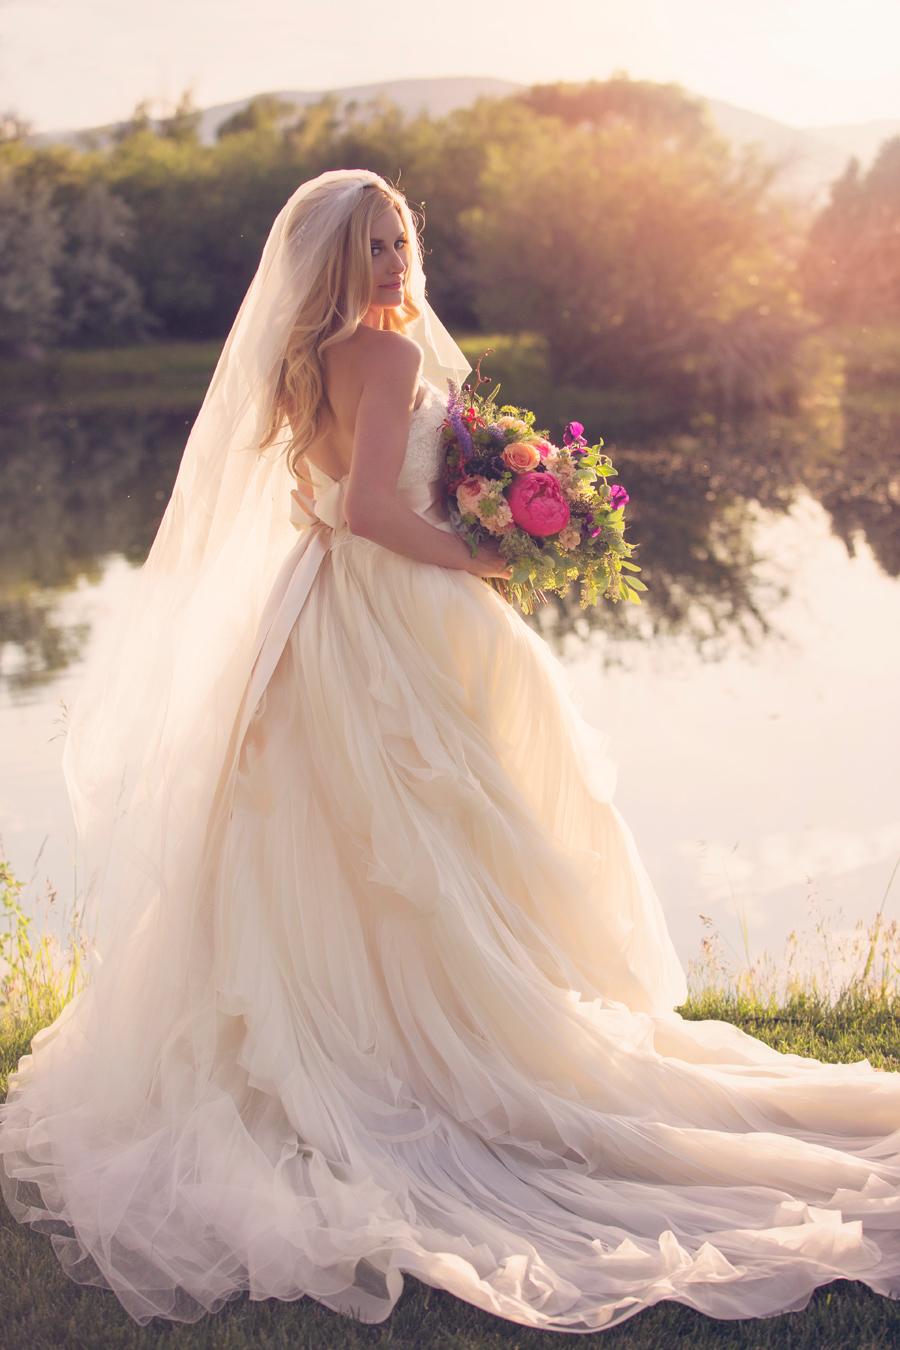 Stephanie Quayle Wedding / Photographer: Arnica Spring Photography / Wedding Design, Planning, & Wedding Flowers: Katalin Green